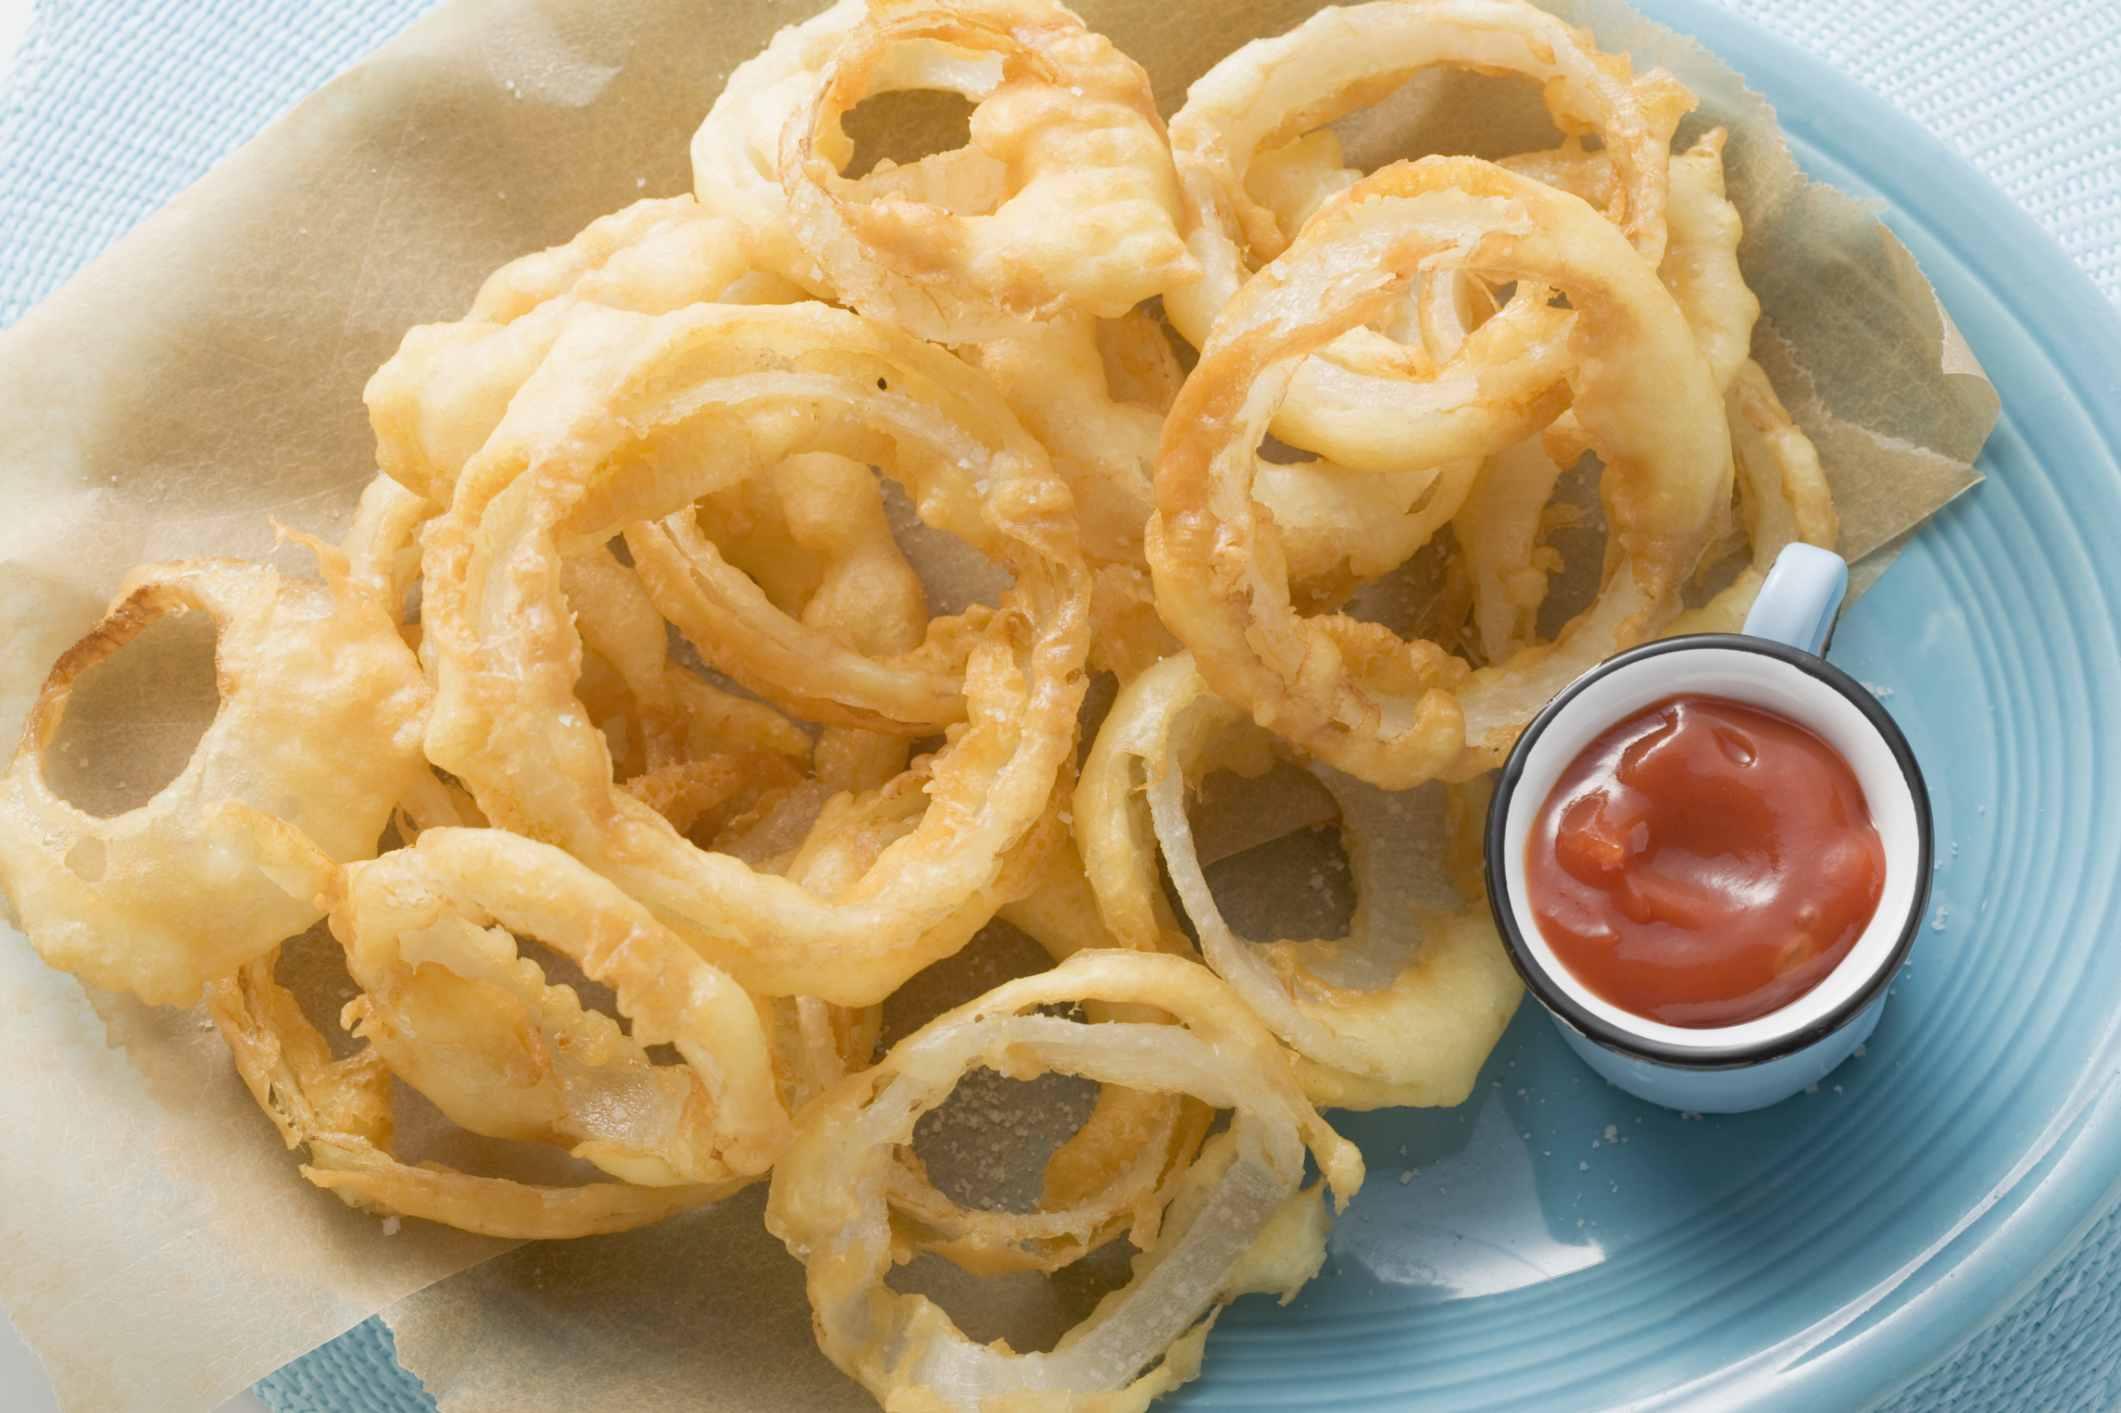 Aros de cebolla en un plato con salsa de tomate